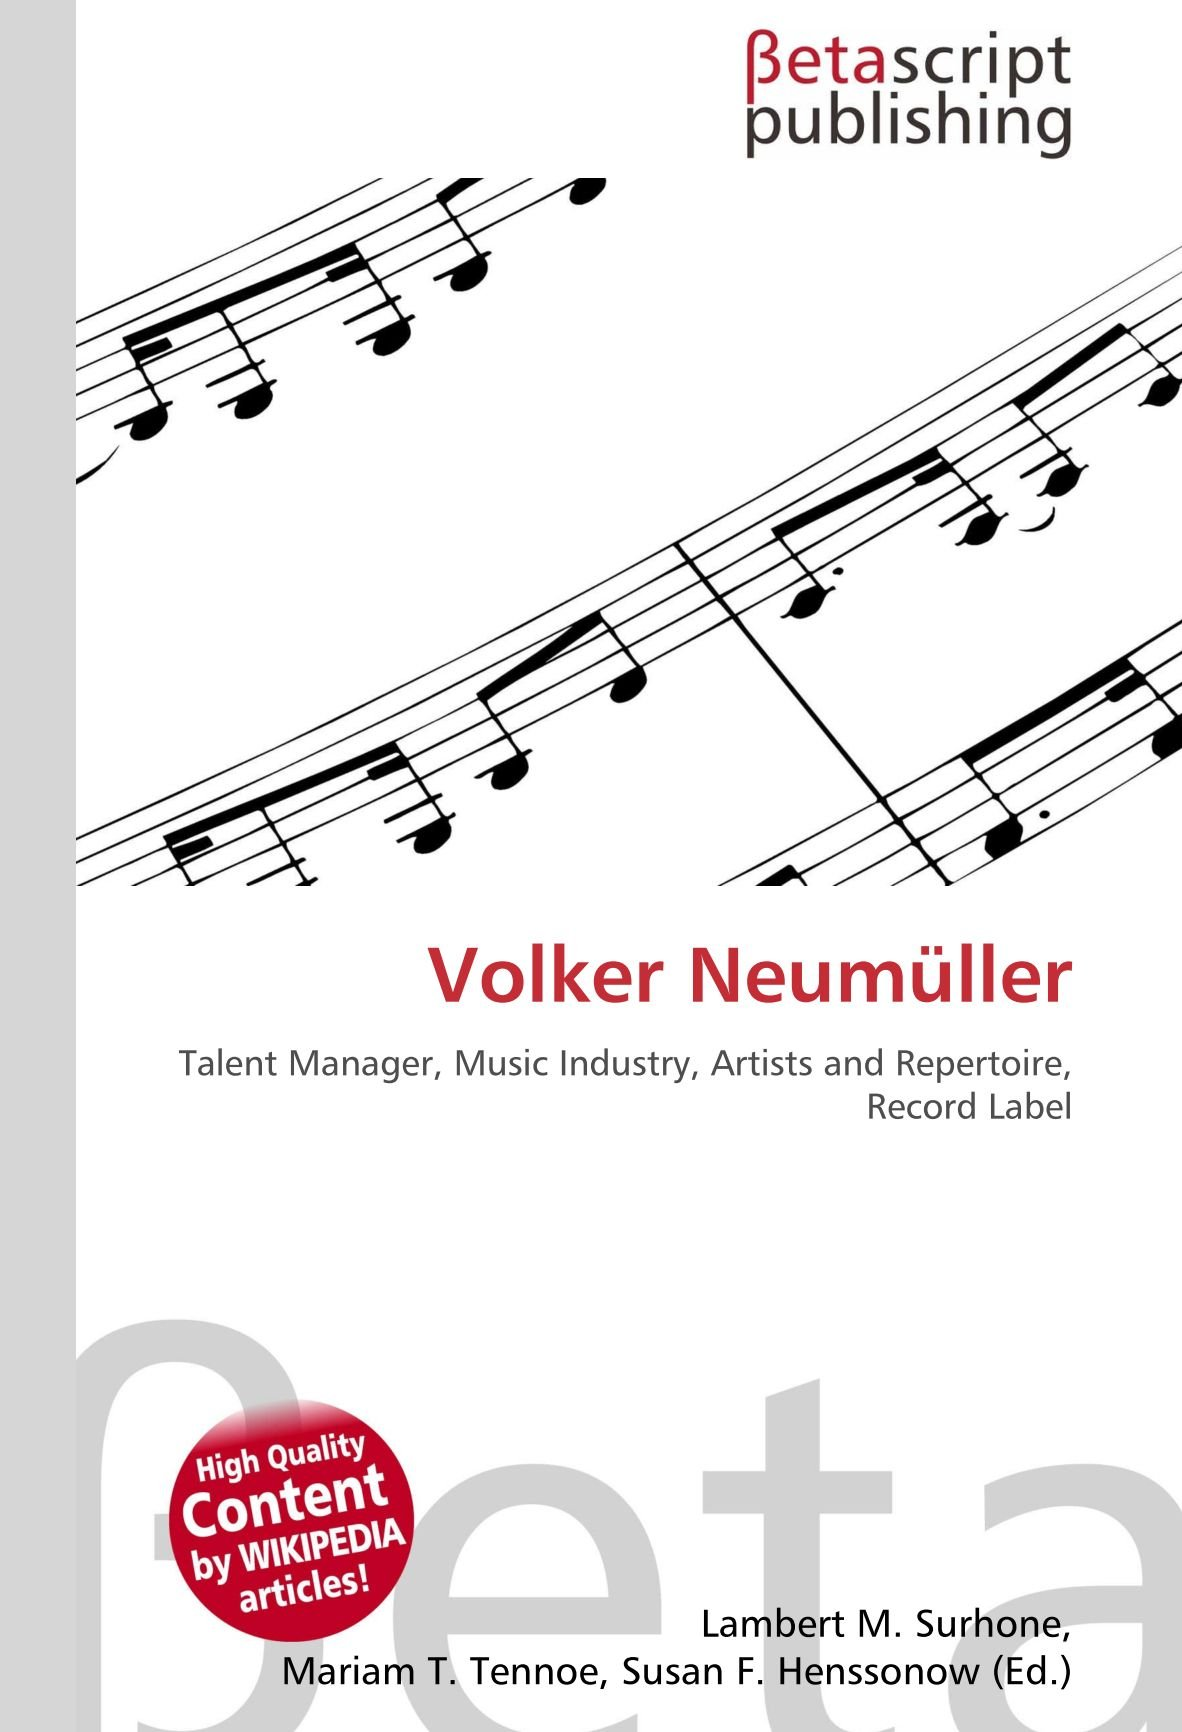 Volker Neumüller: Talent Manager, Music Industry, Artists